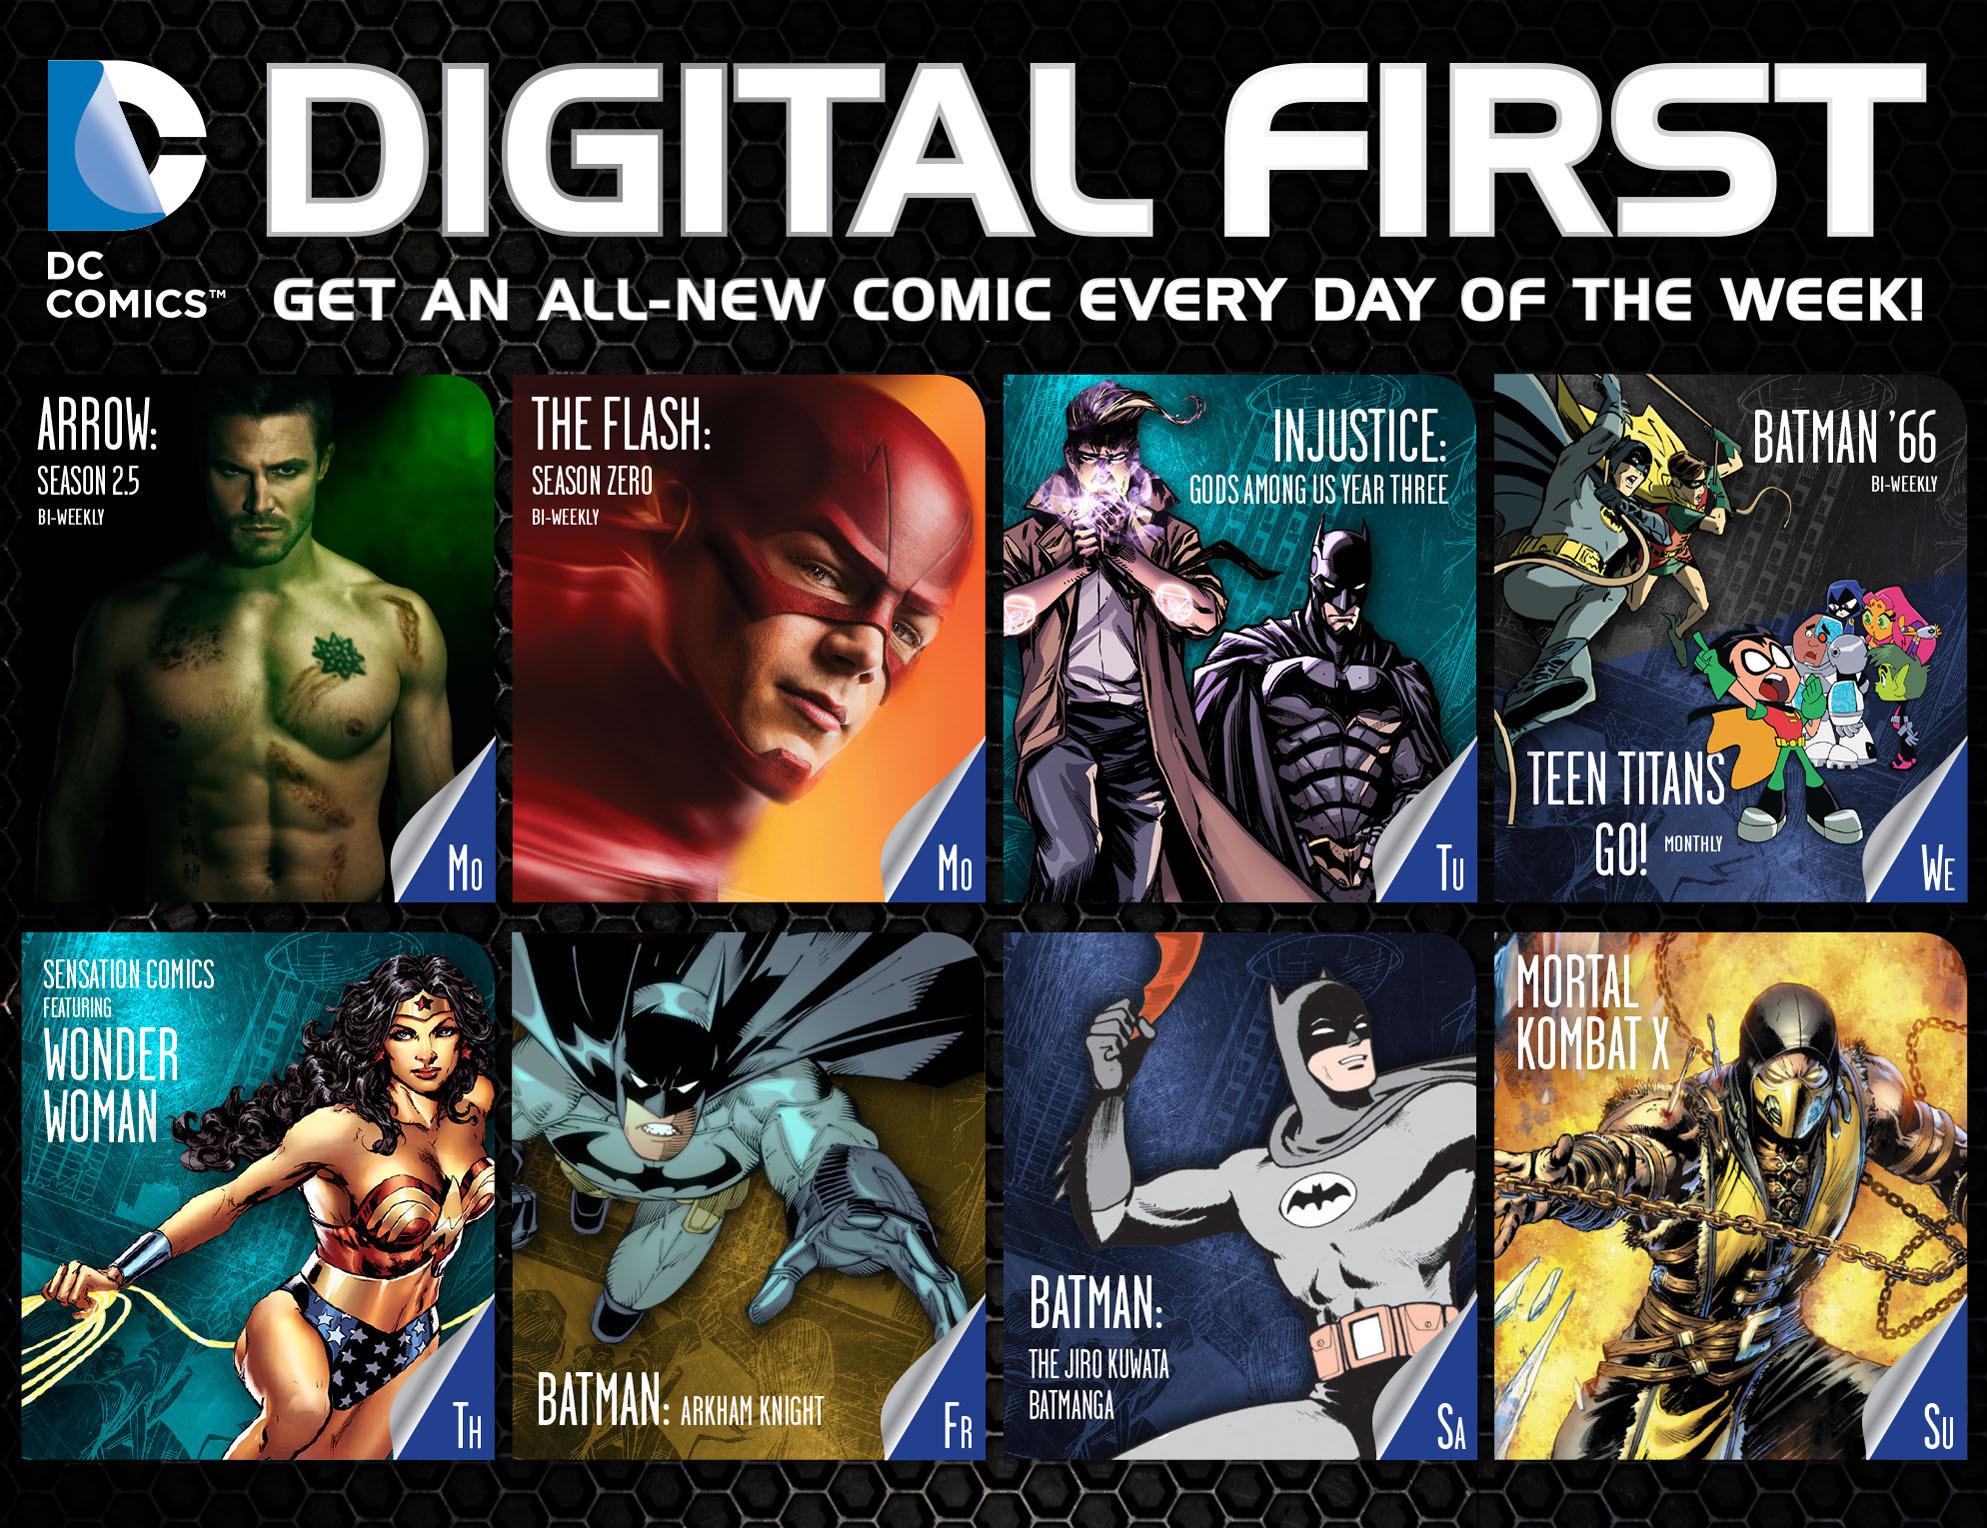 Batman: Arkham Knight [I] Issue #1 #3 - English 23